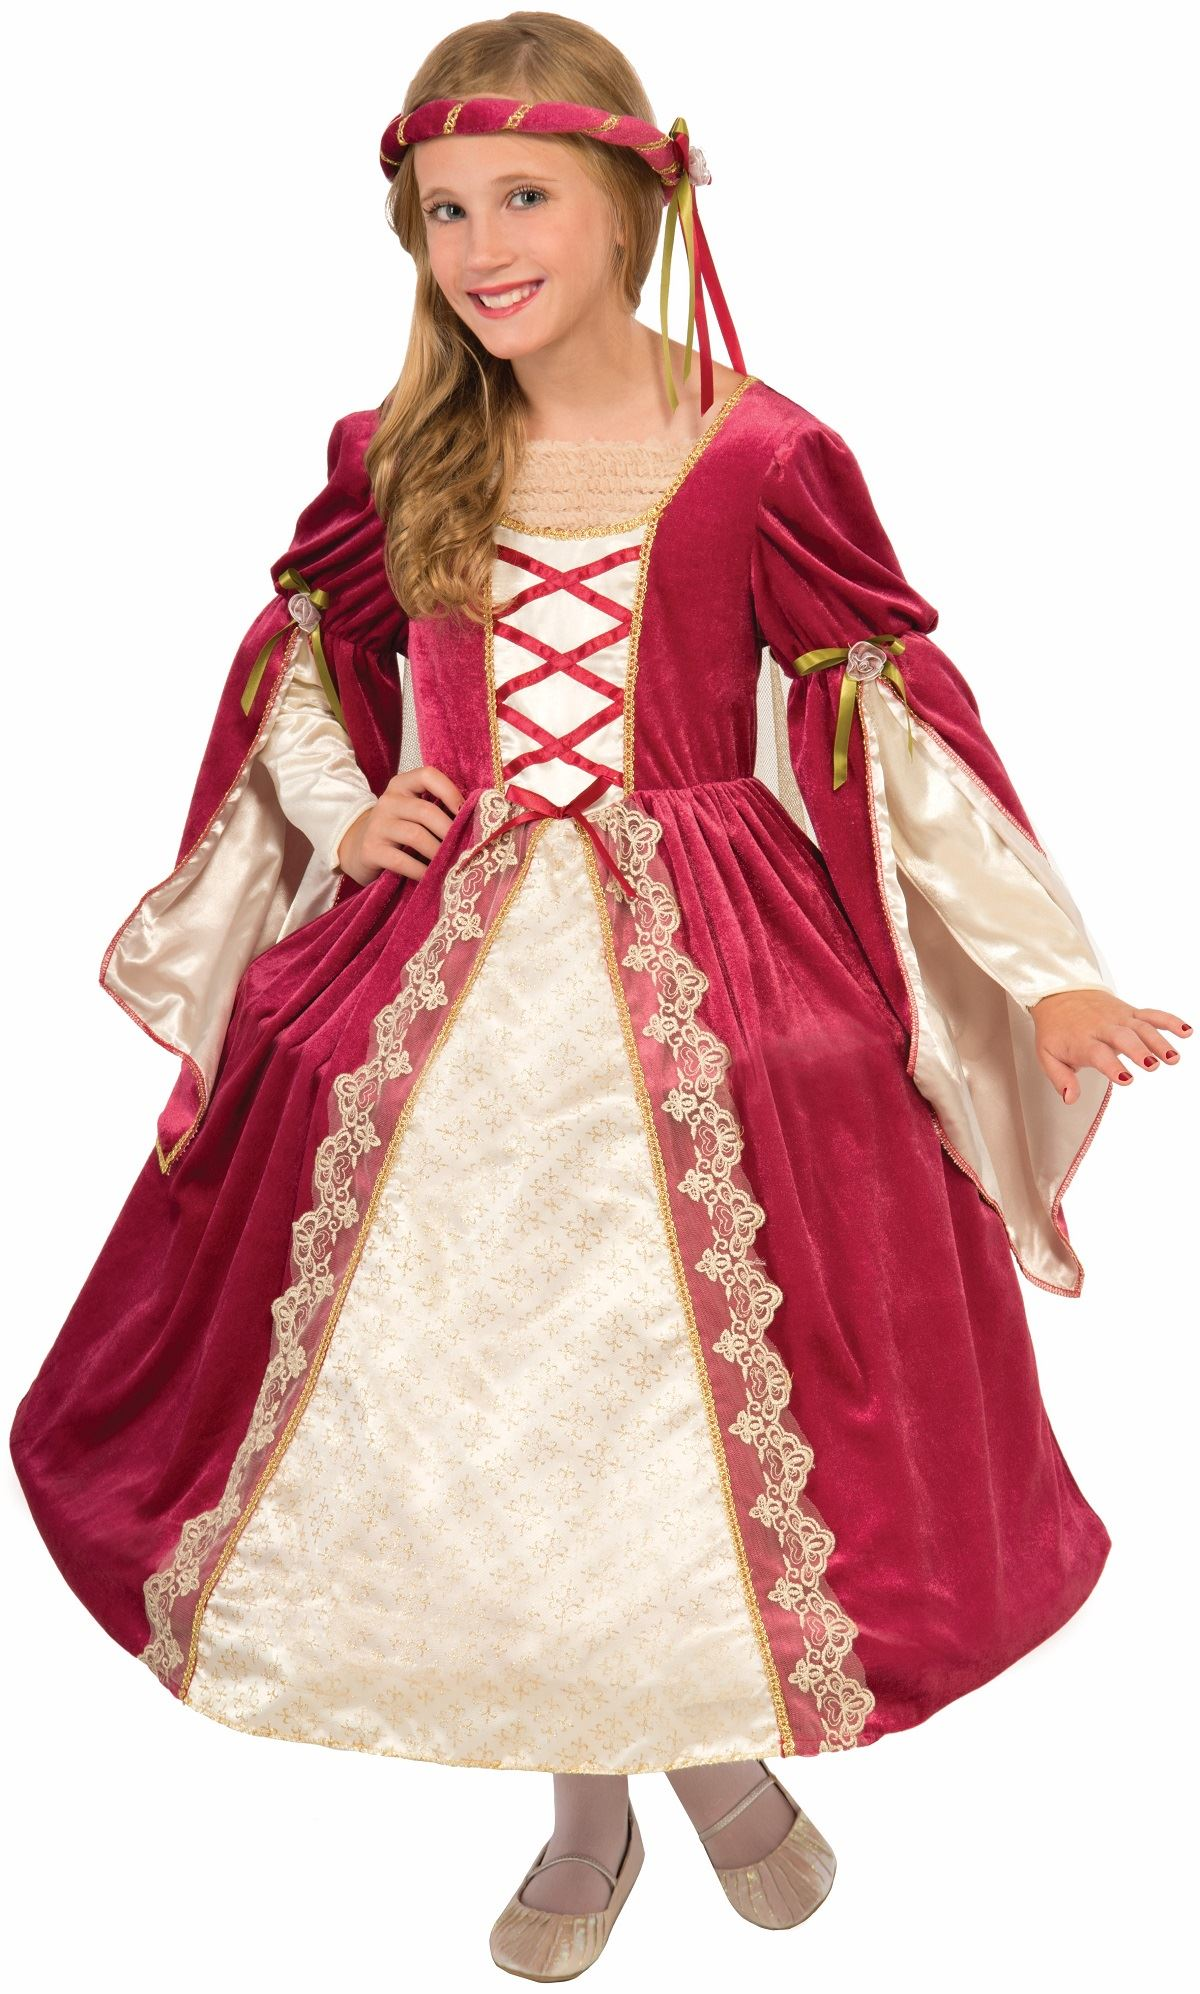 Kids Medieval Princess Girls Costume  sc 1 st  The Costume Land & Kids Medieval Princess Girls Costume | $30.99 | The Costume Land